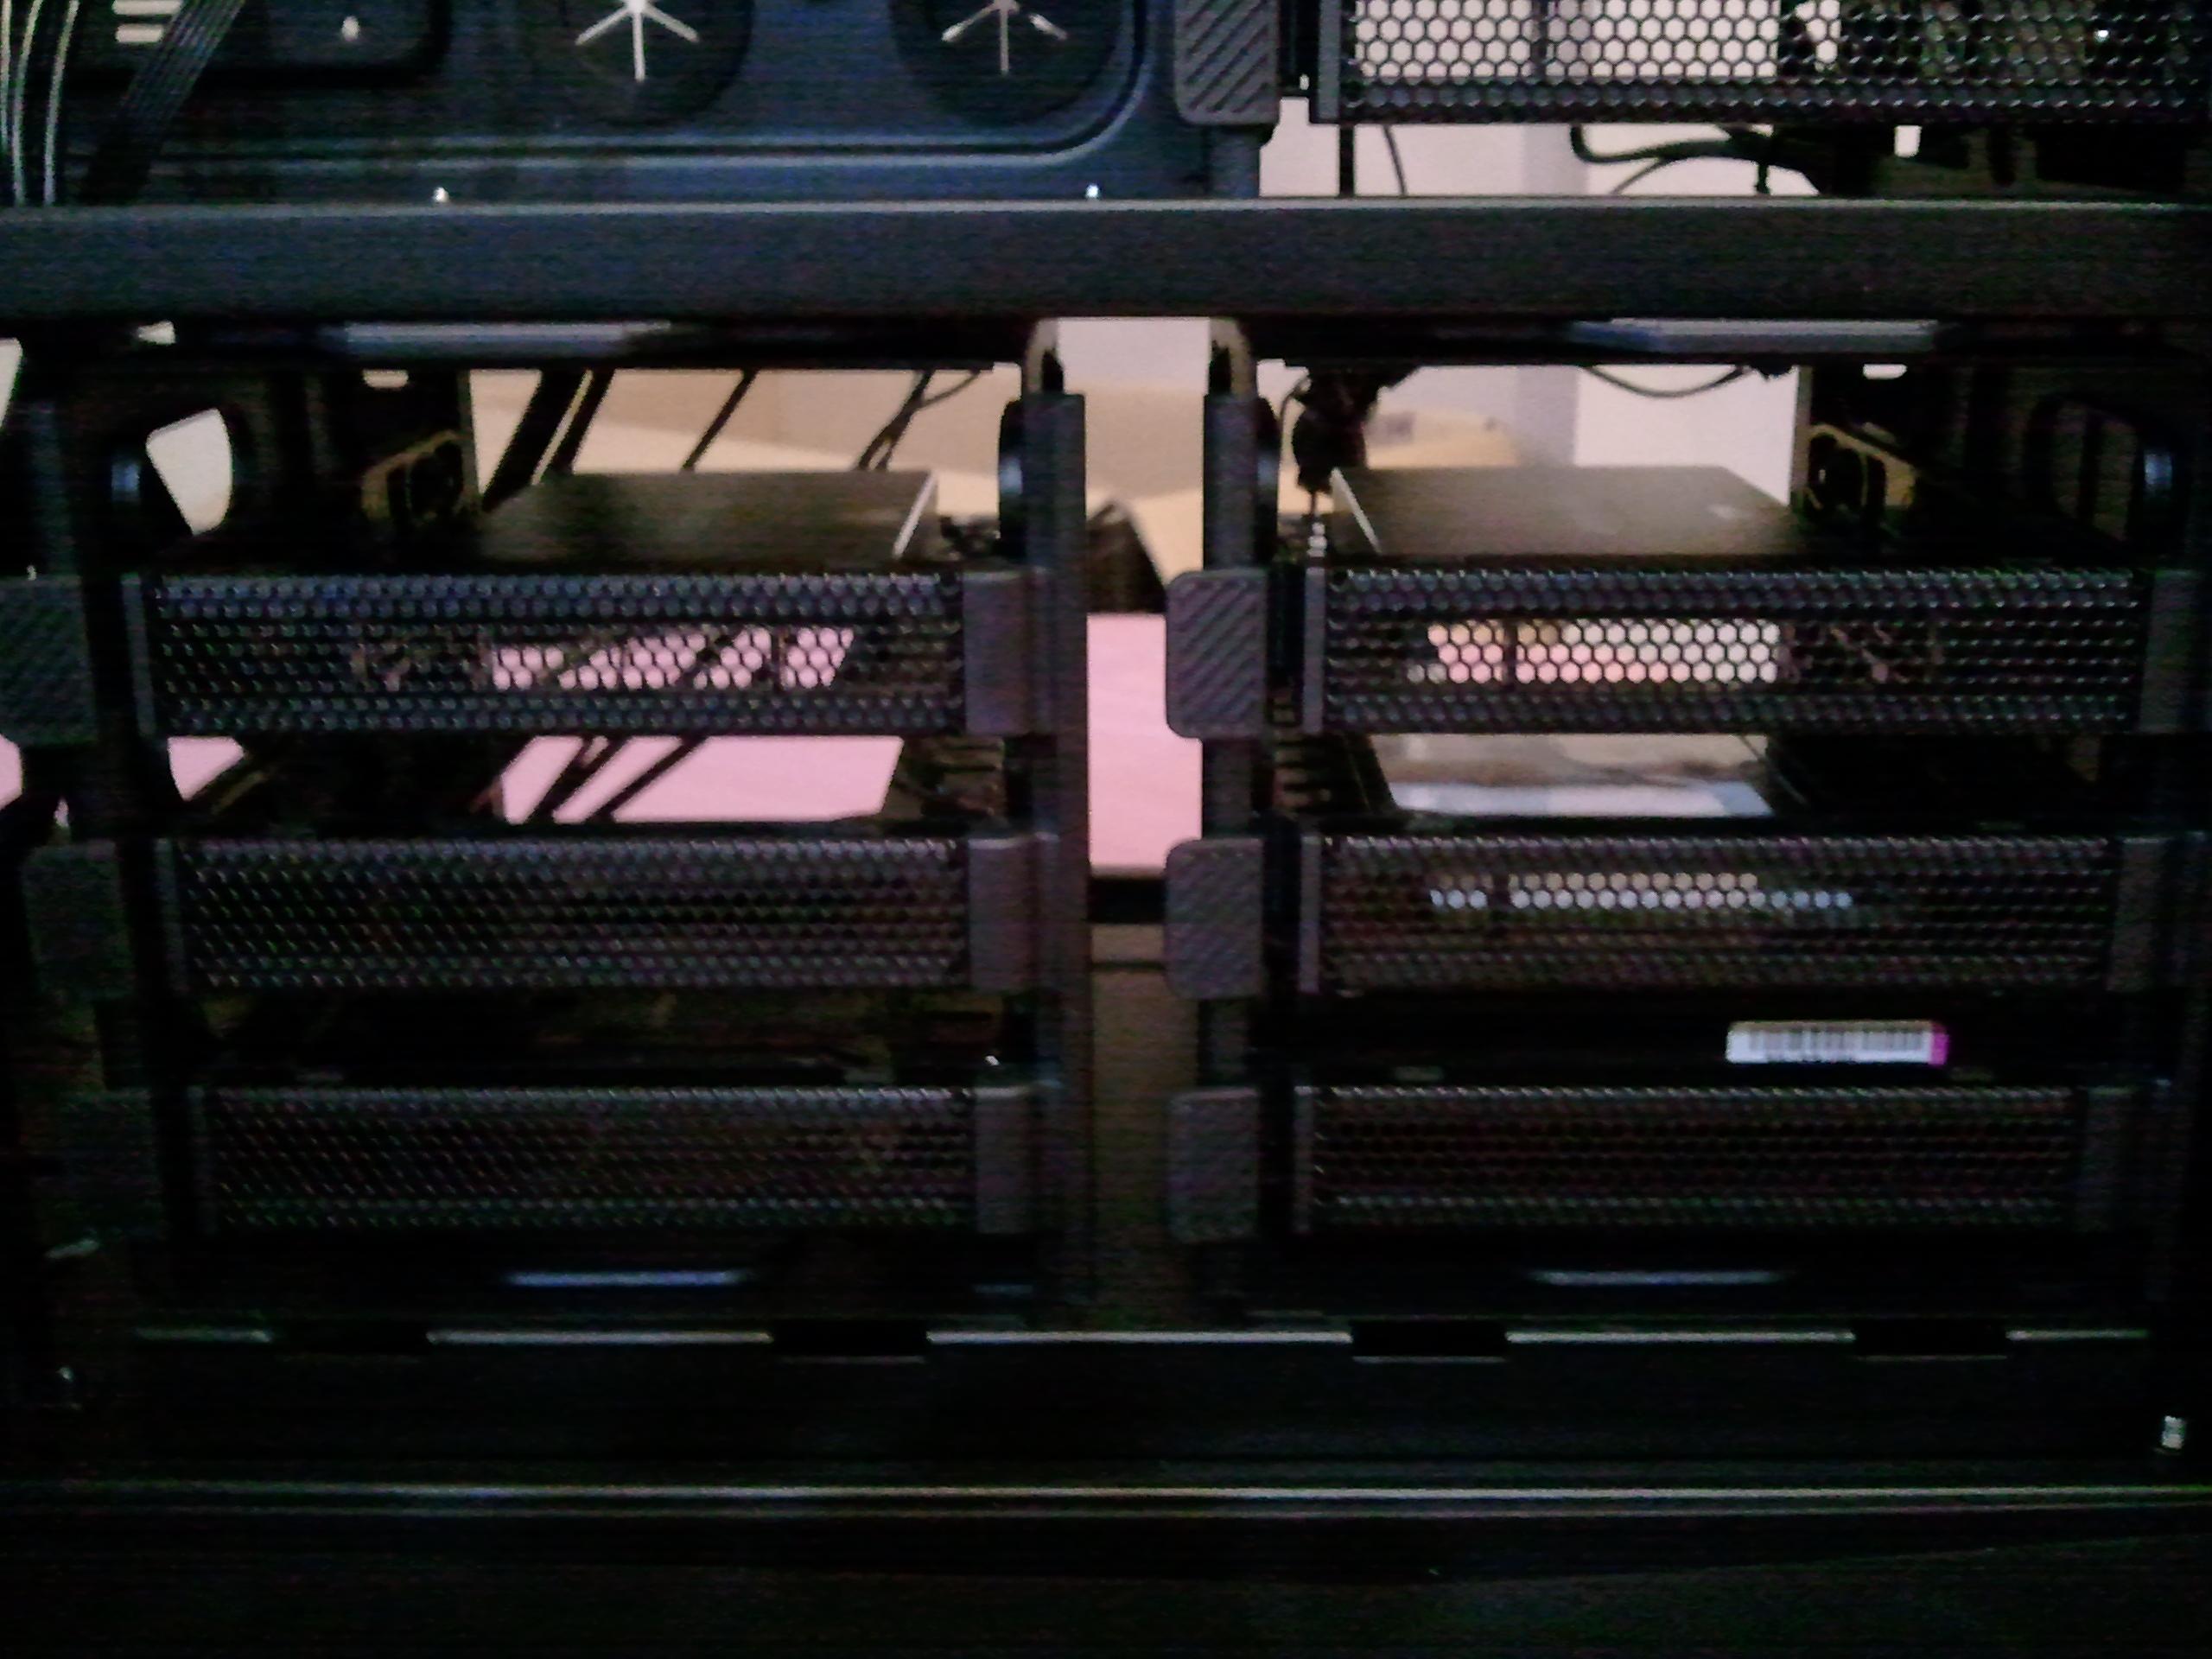 Lab Hardware